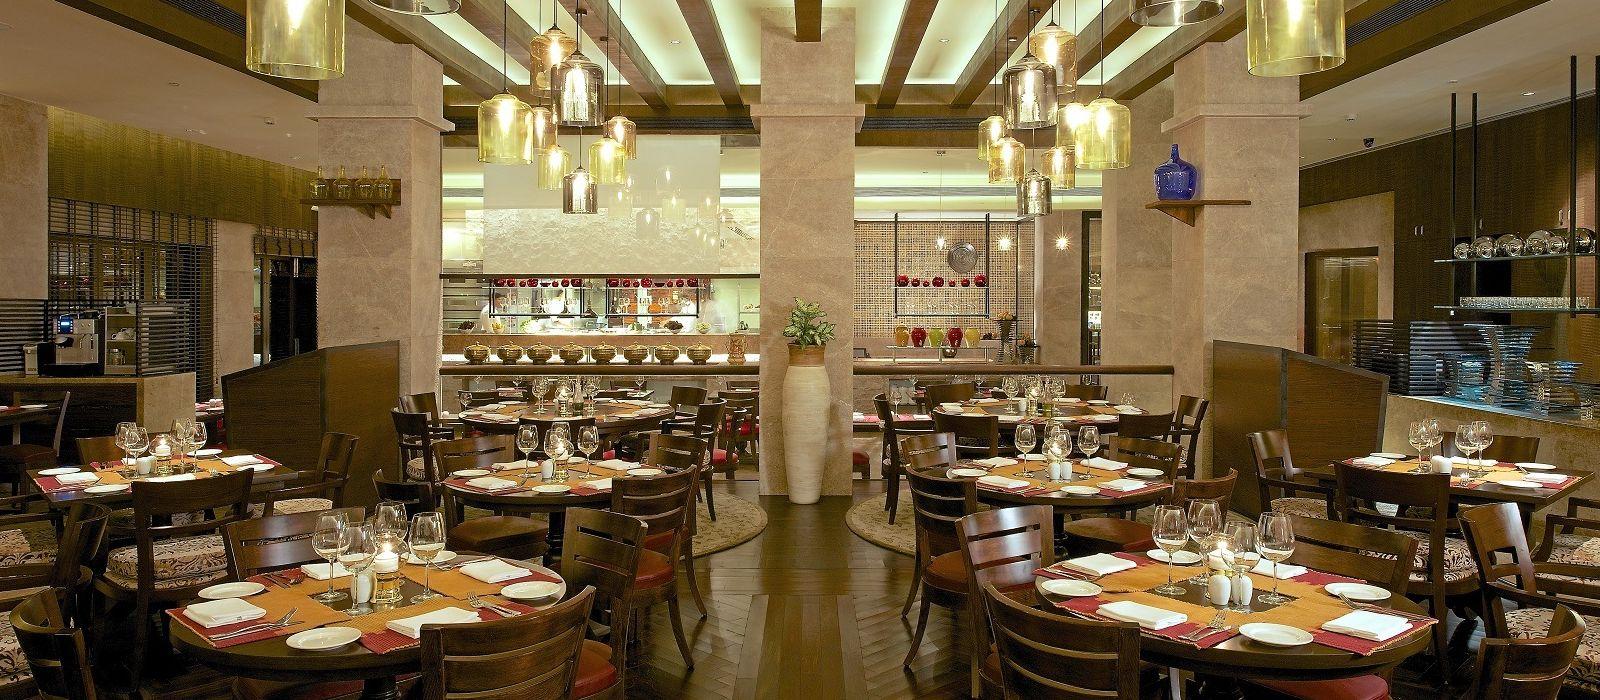 Hotel Vivanta by Taj – President Central & West India